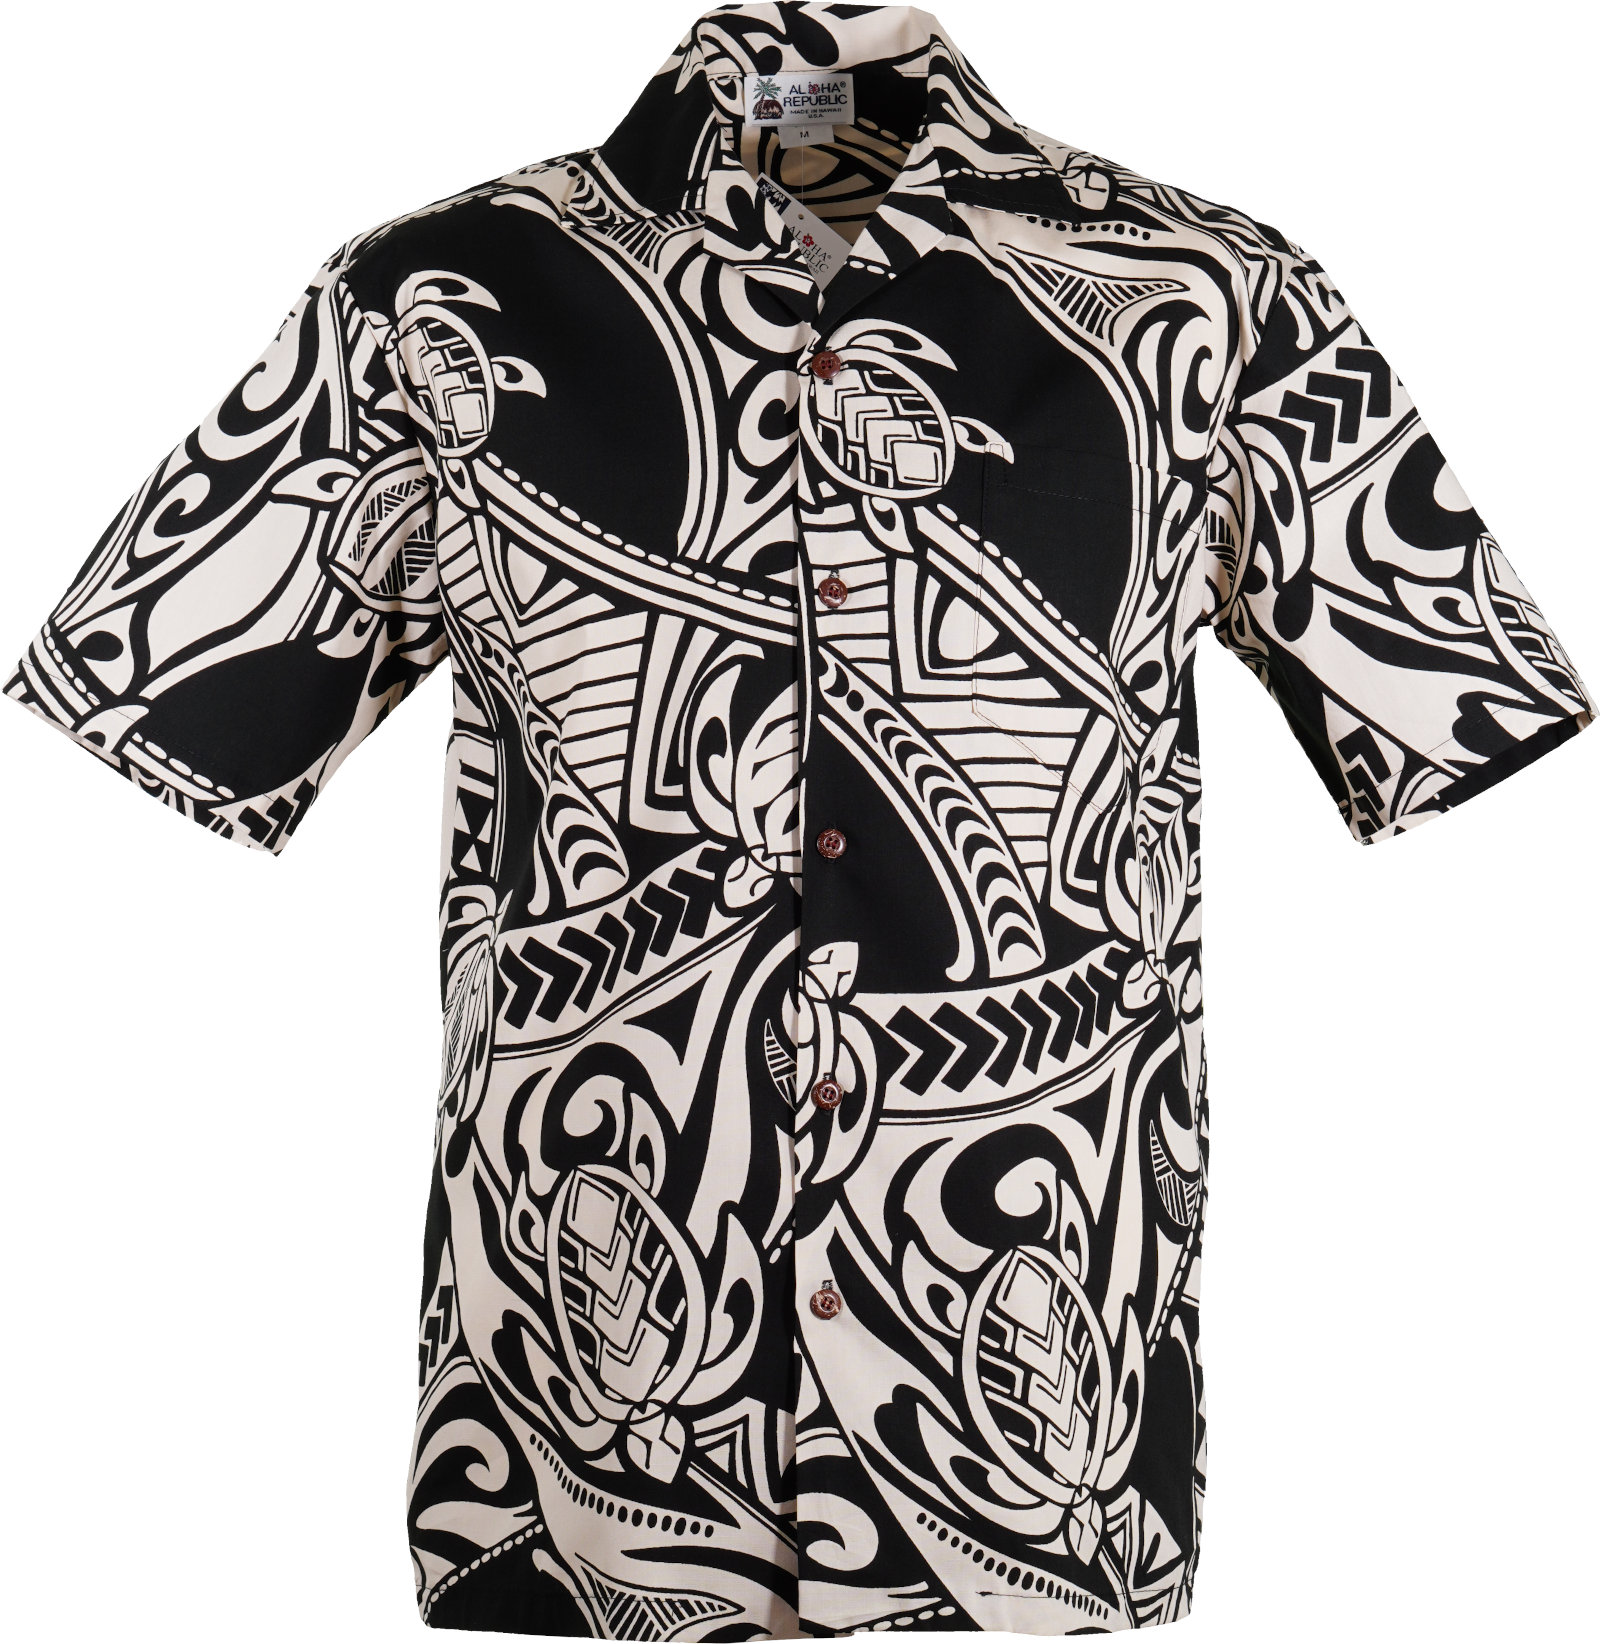 Original Hawaiihemd -Poly Power-